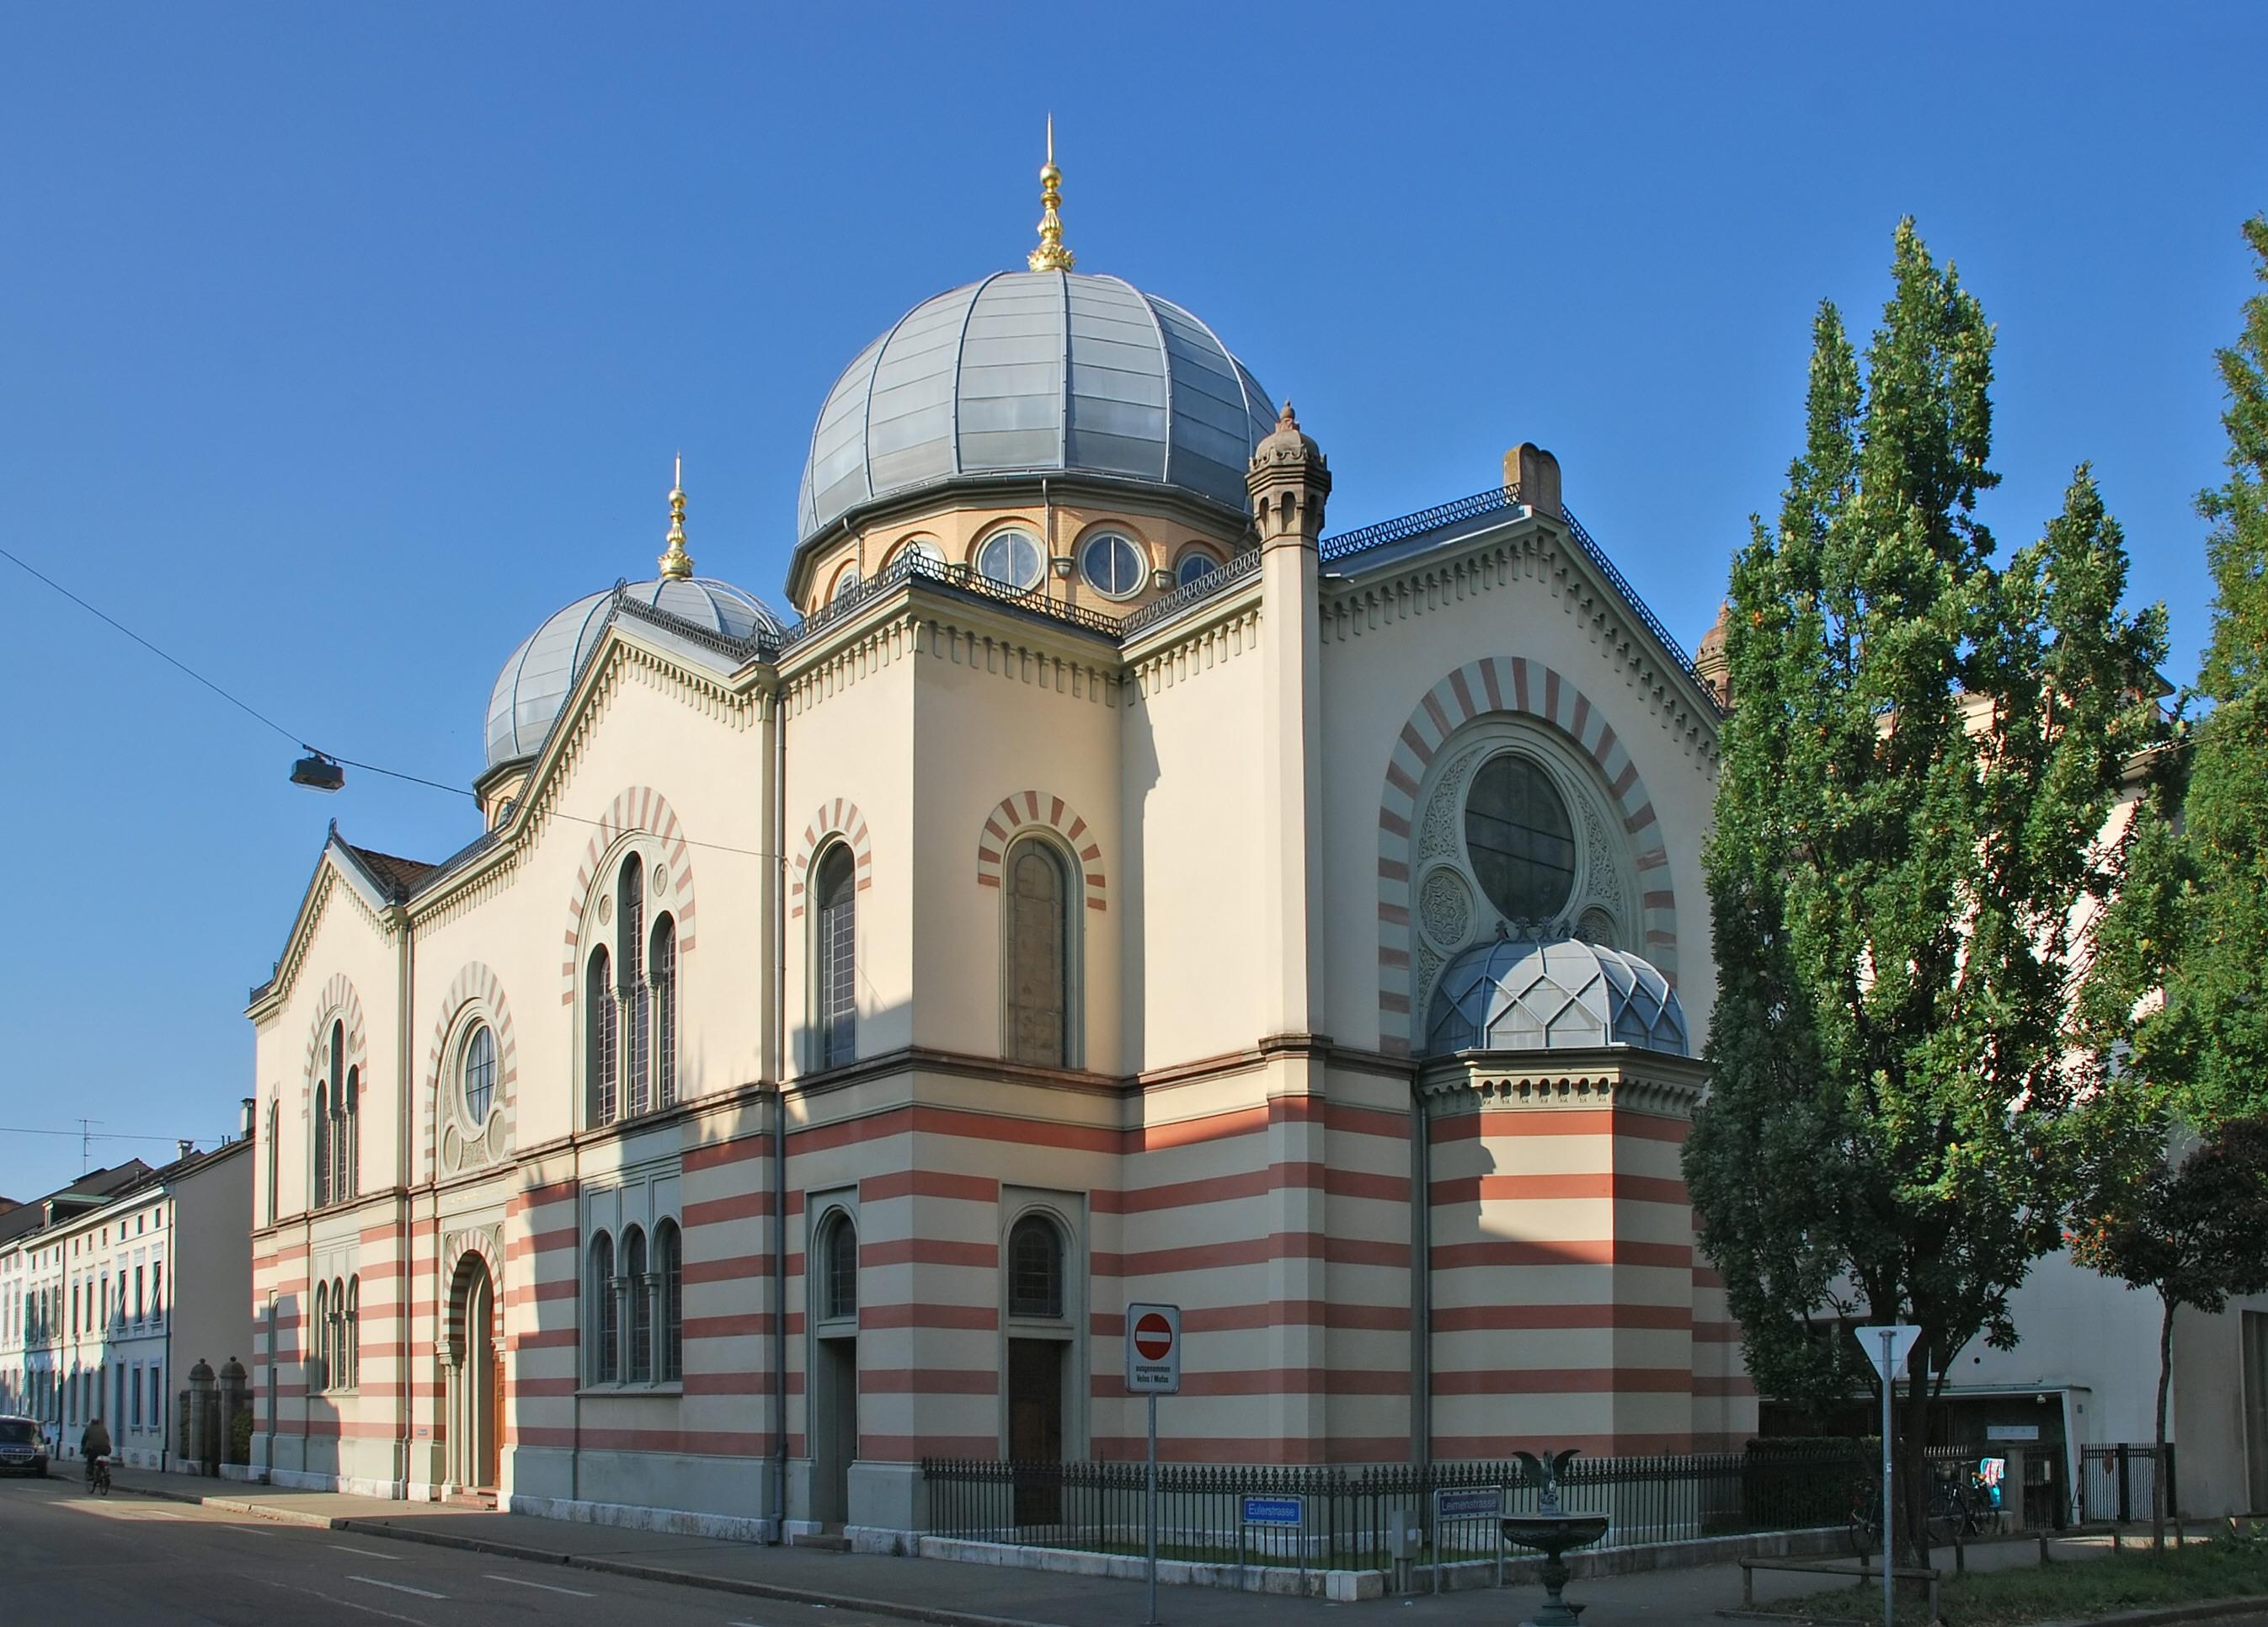 File:Basler Synagoge(ws)-2.jpg - Wikimedia Commons